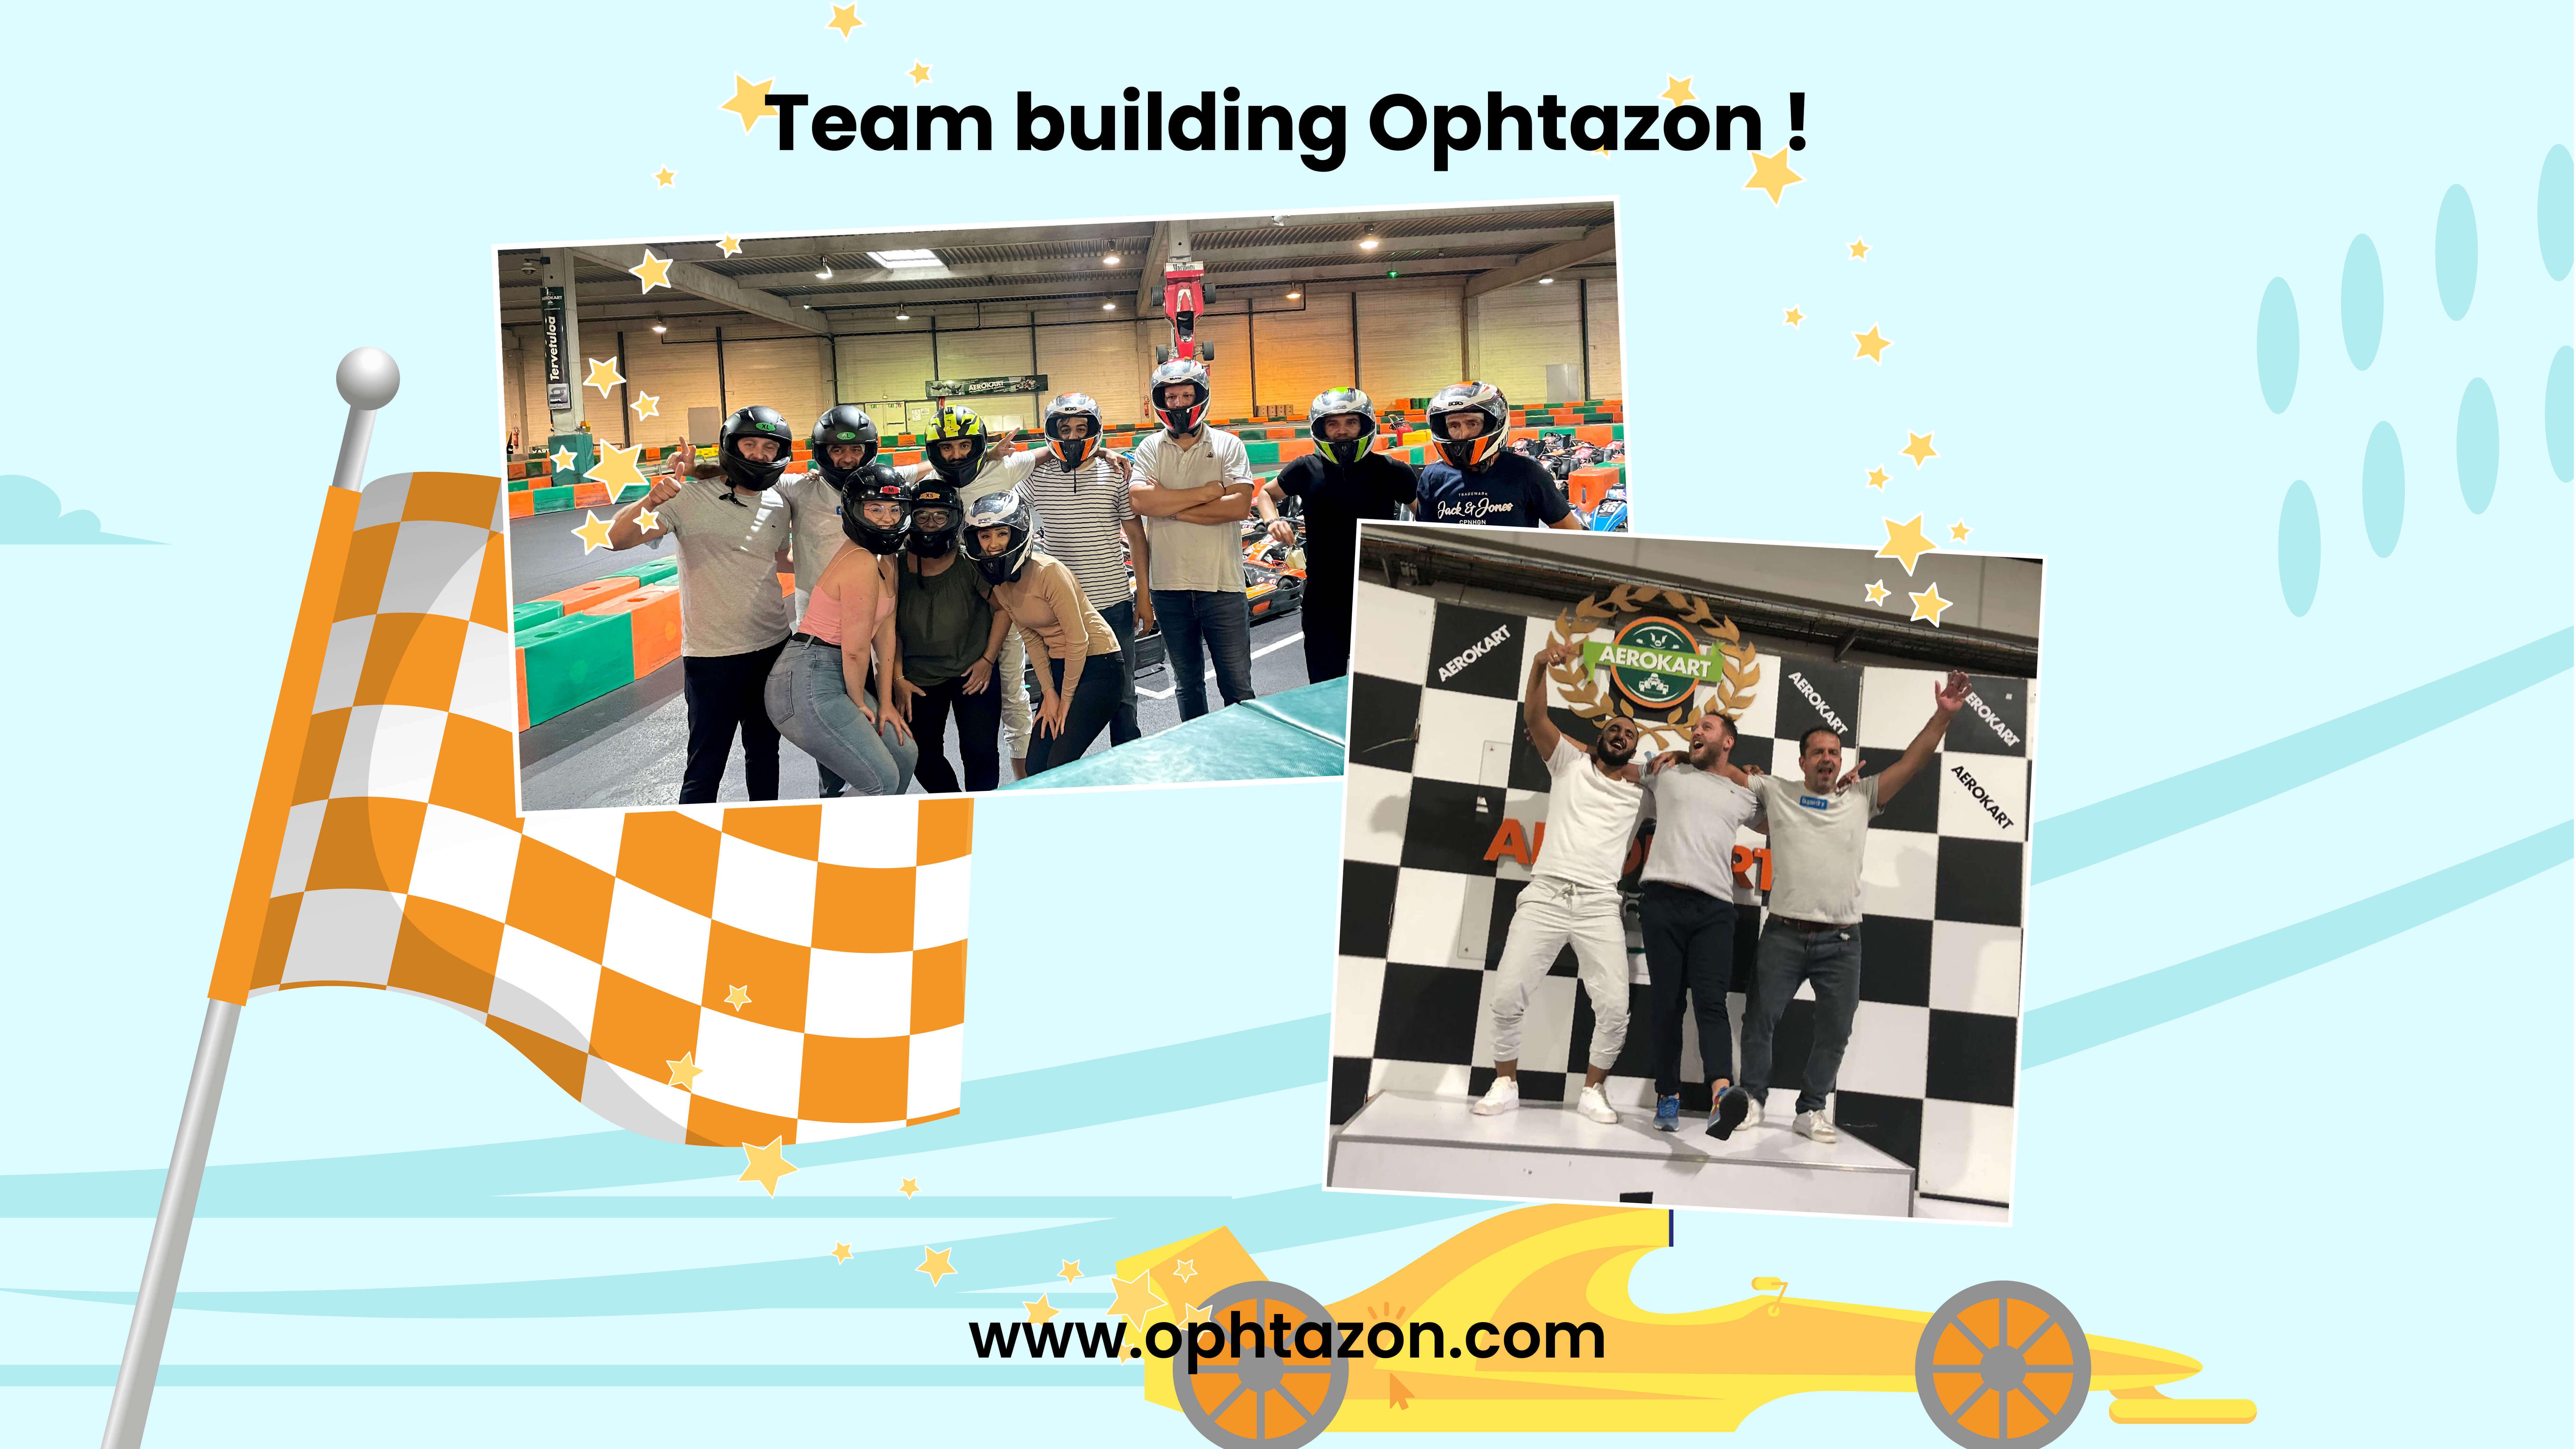 Une team building chez Ophtazon !